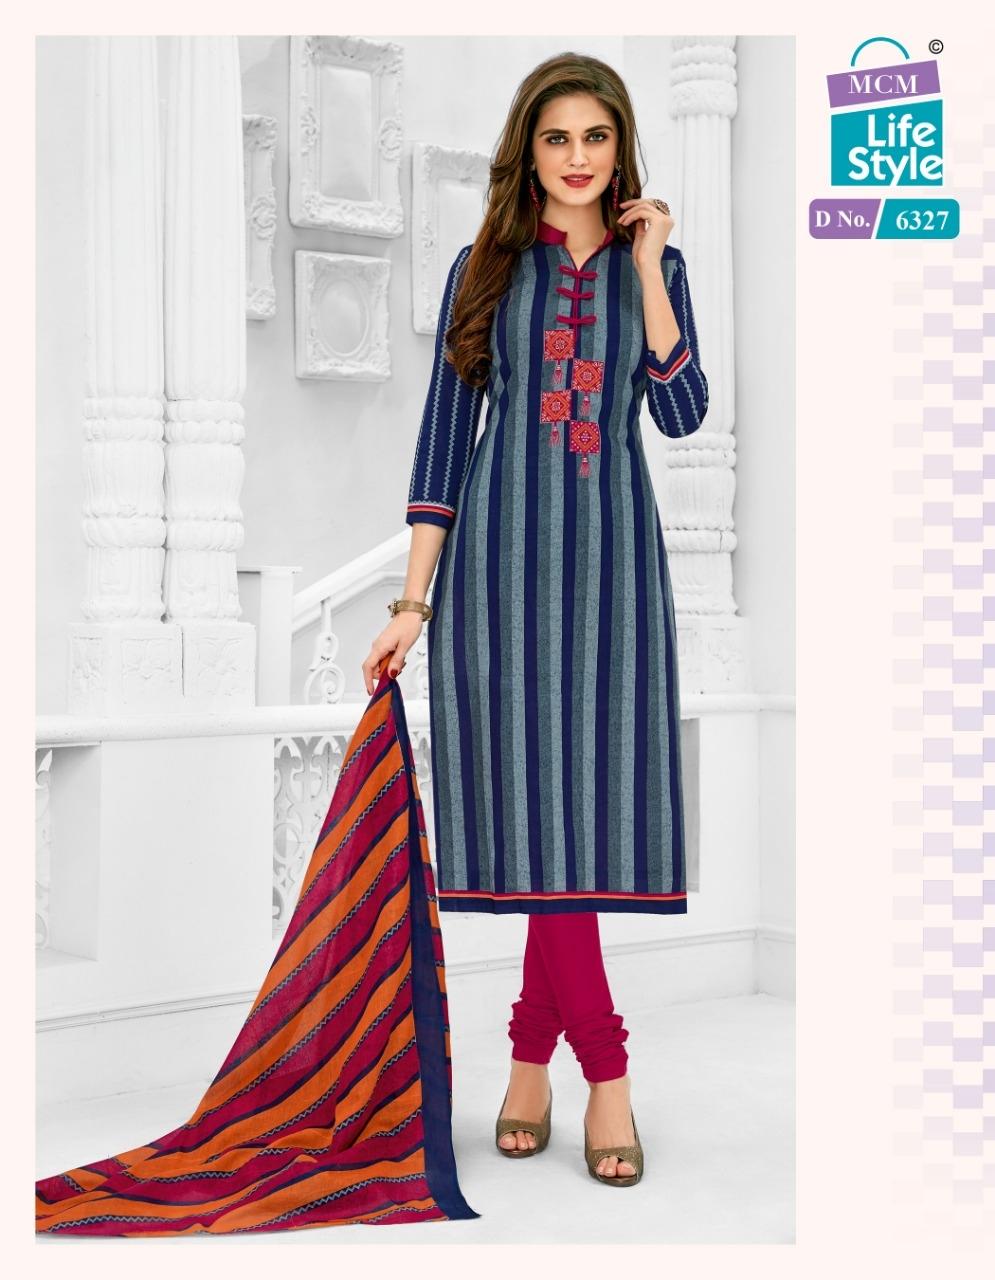 Mcm Advance Vol 17 Designer Cotton Daily Wear Suits In Best Wholesale Rate